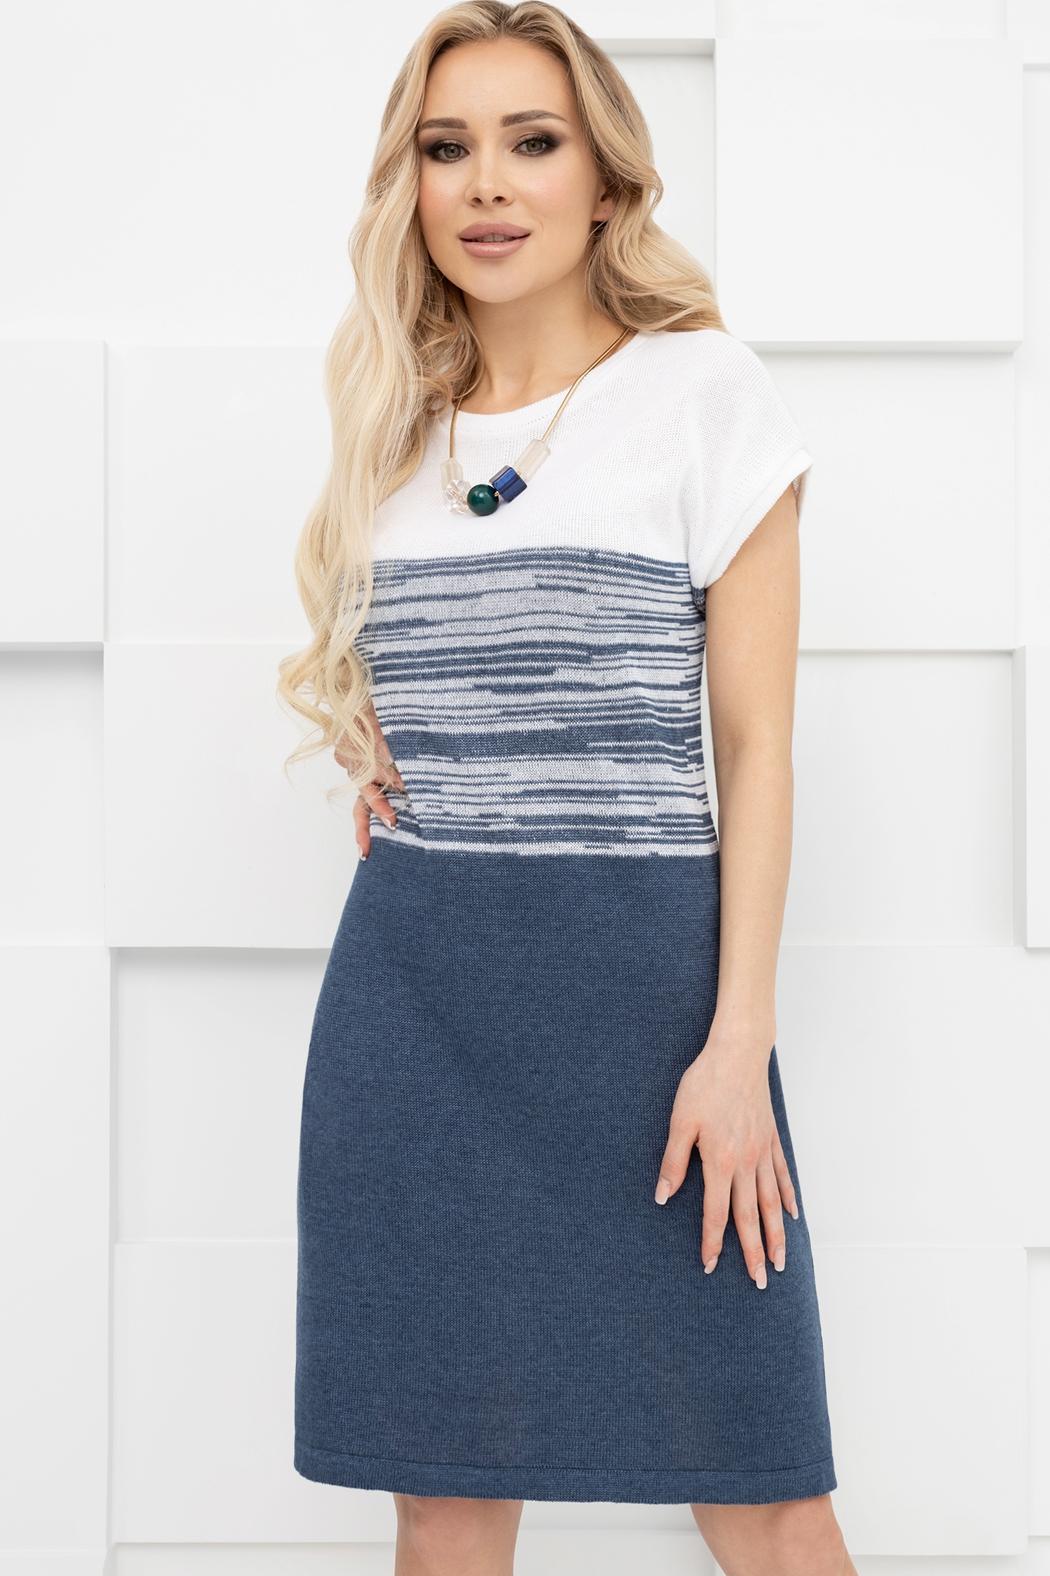 Бордовая юбка-карандаш LAVI-Замша бордовый (ткань - Замша